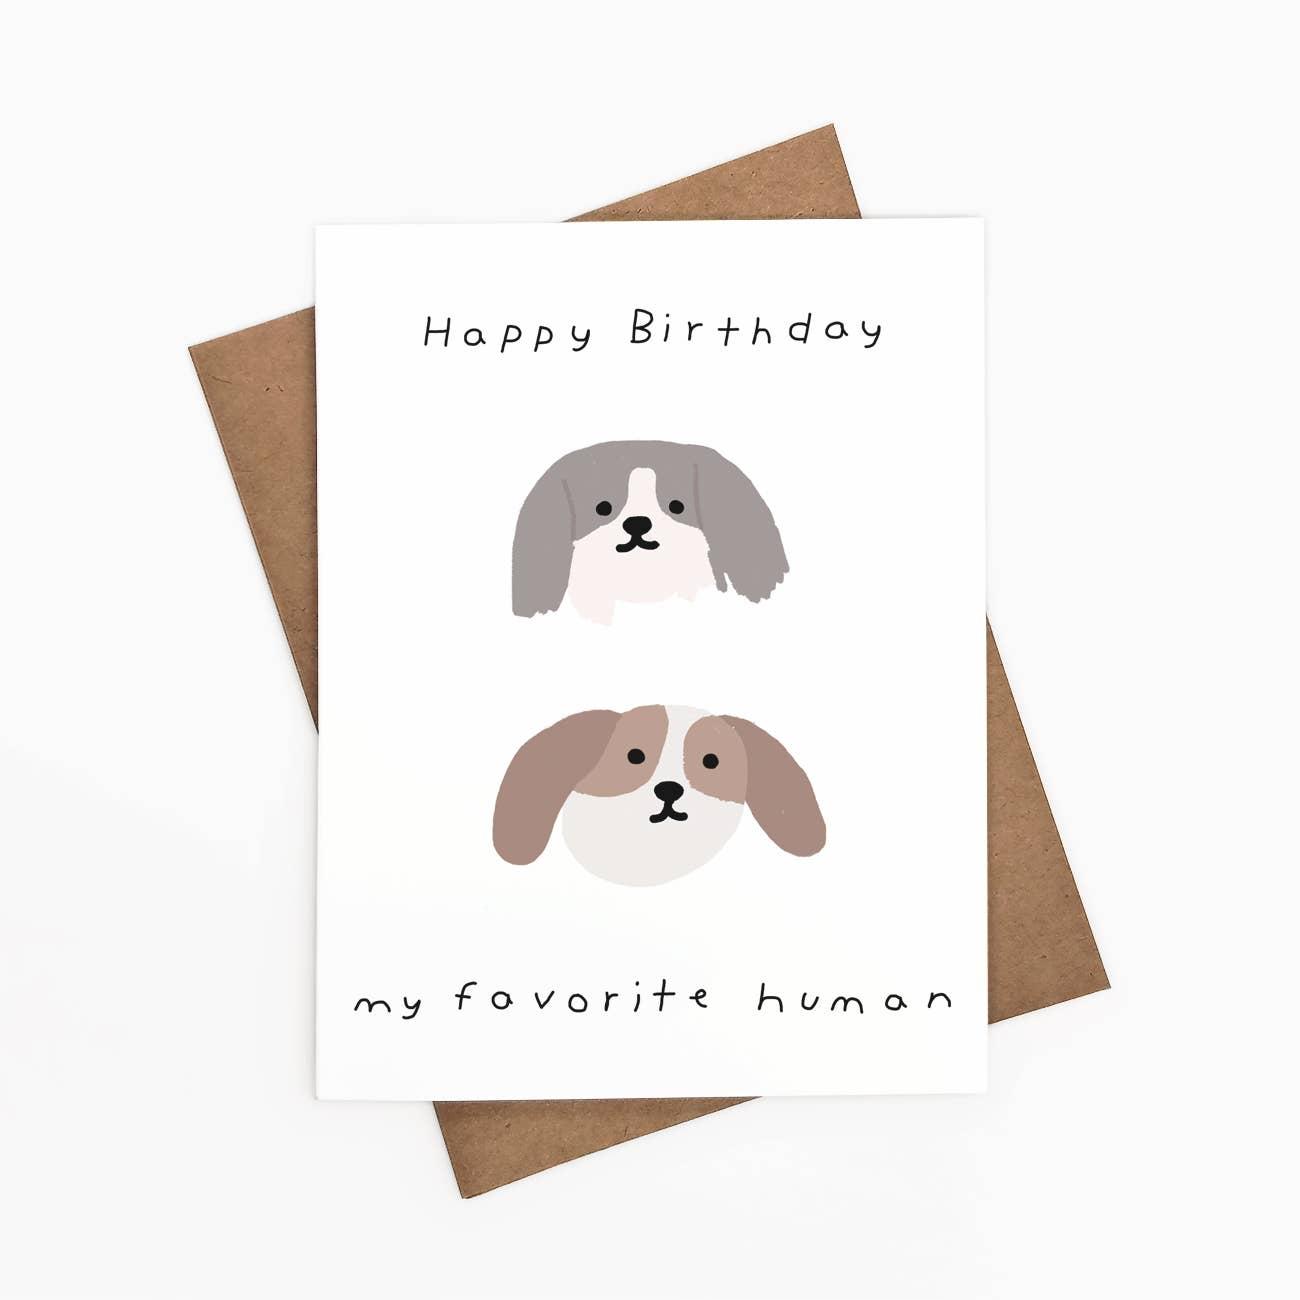 Happy Birthday My Favorite Human Greeting Card   Trada Marketplace